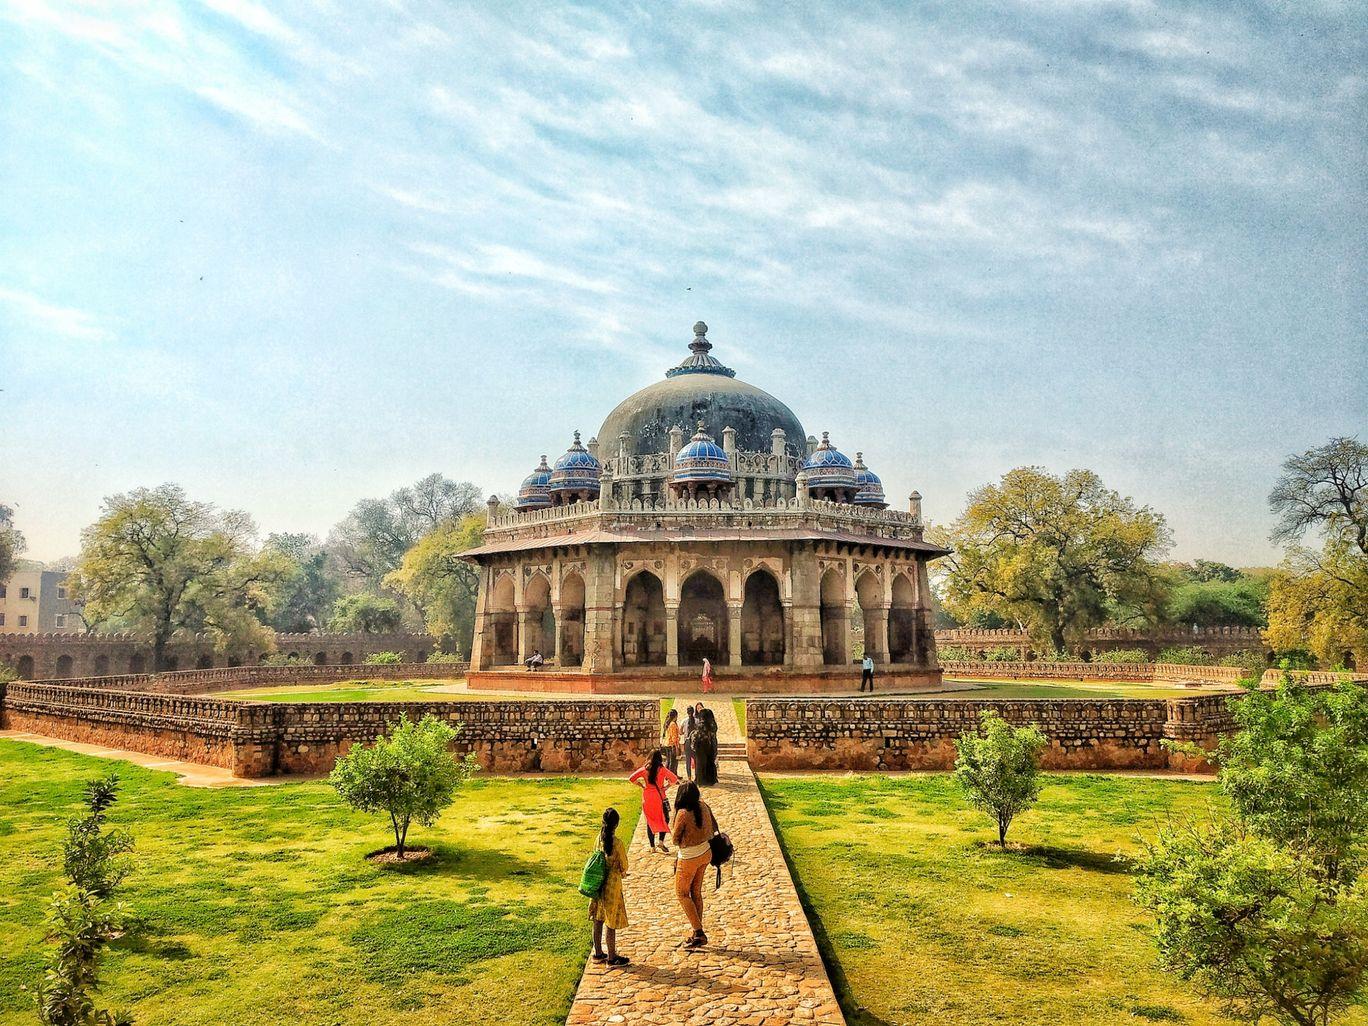 Photo of Humayun's Tomb By Rajib Saha